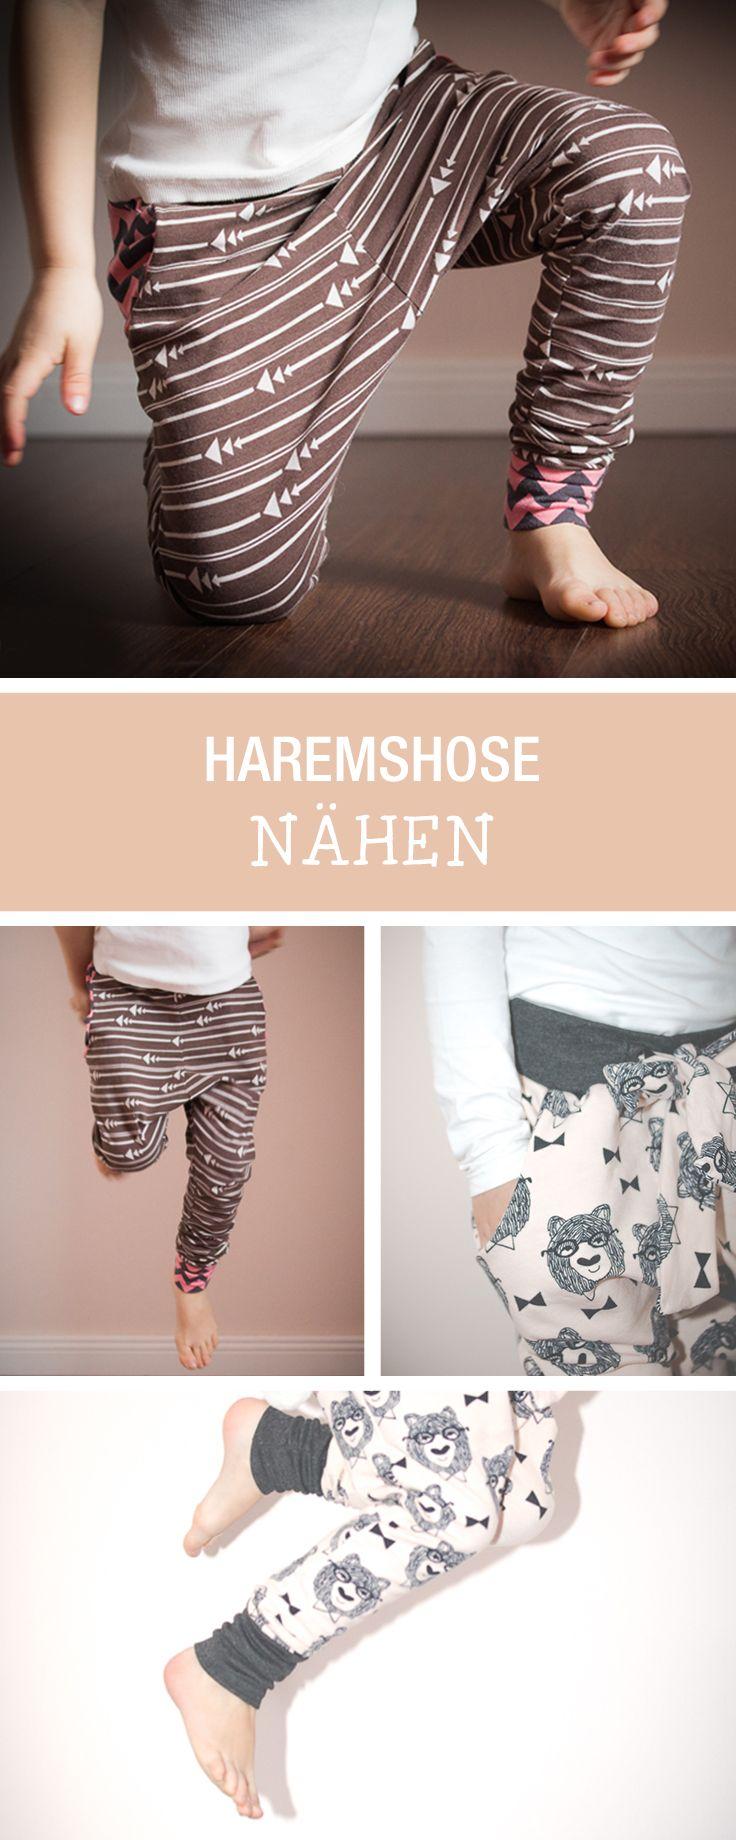 Nähanleitung für Kindermode: Süße Haremshose nähen / children sewing tutorial: how to sew comfy pants via DaWanda.com